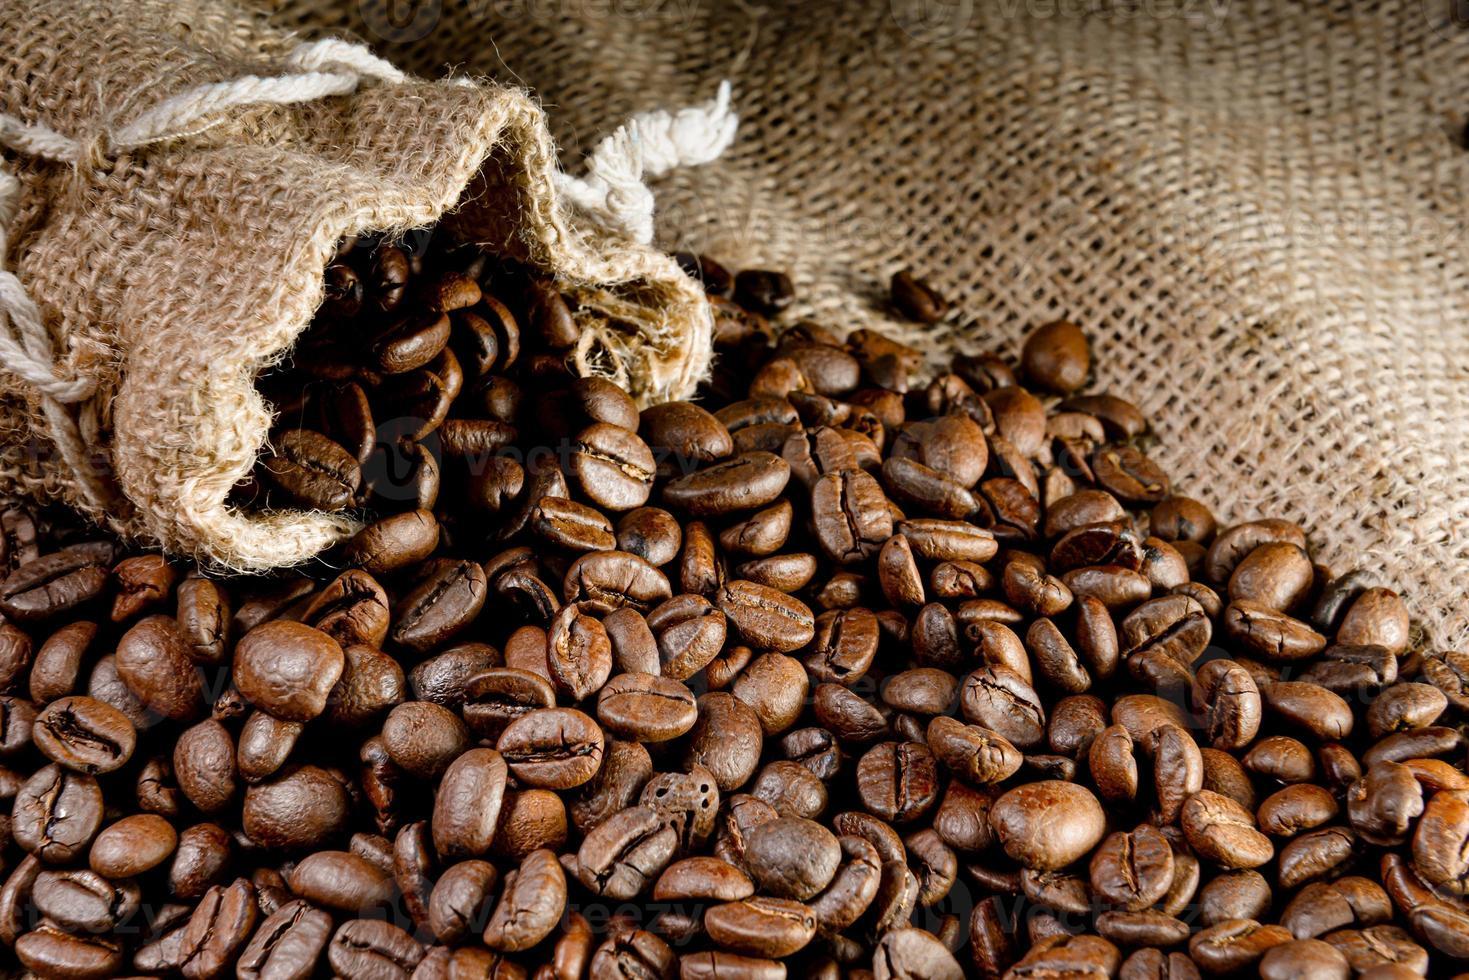 Coffee beans in a linen bag, selective focus photo